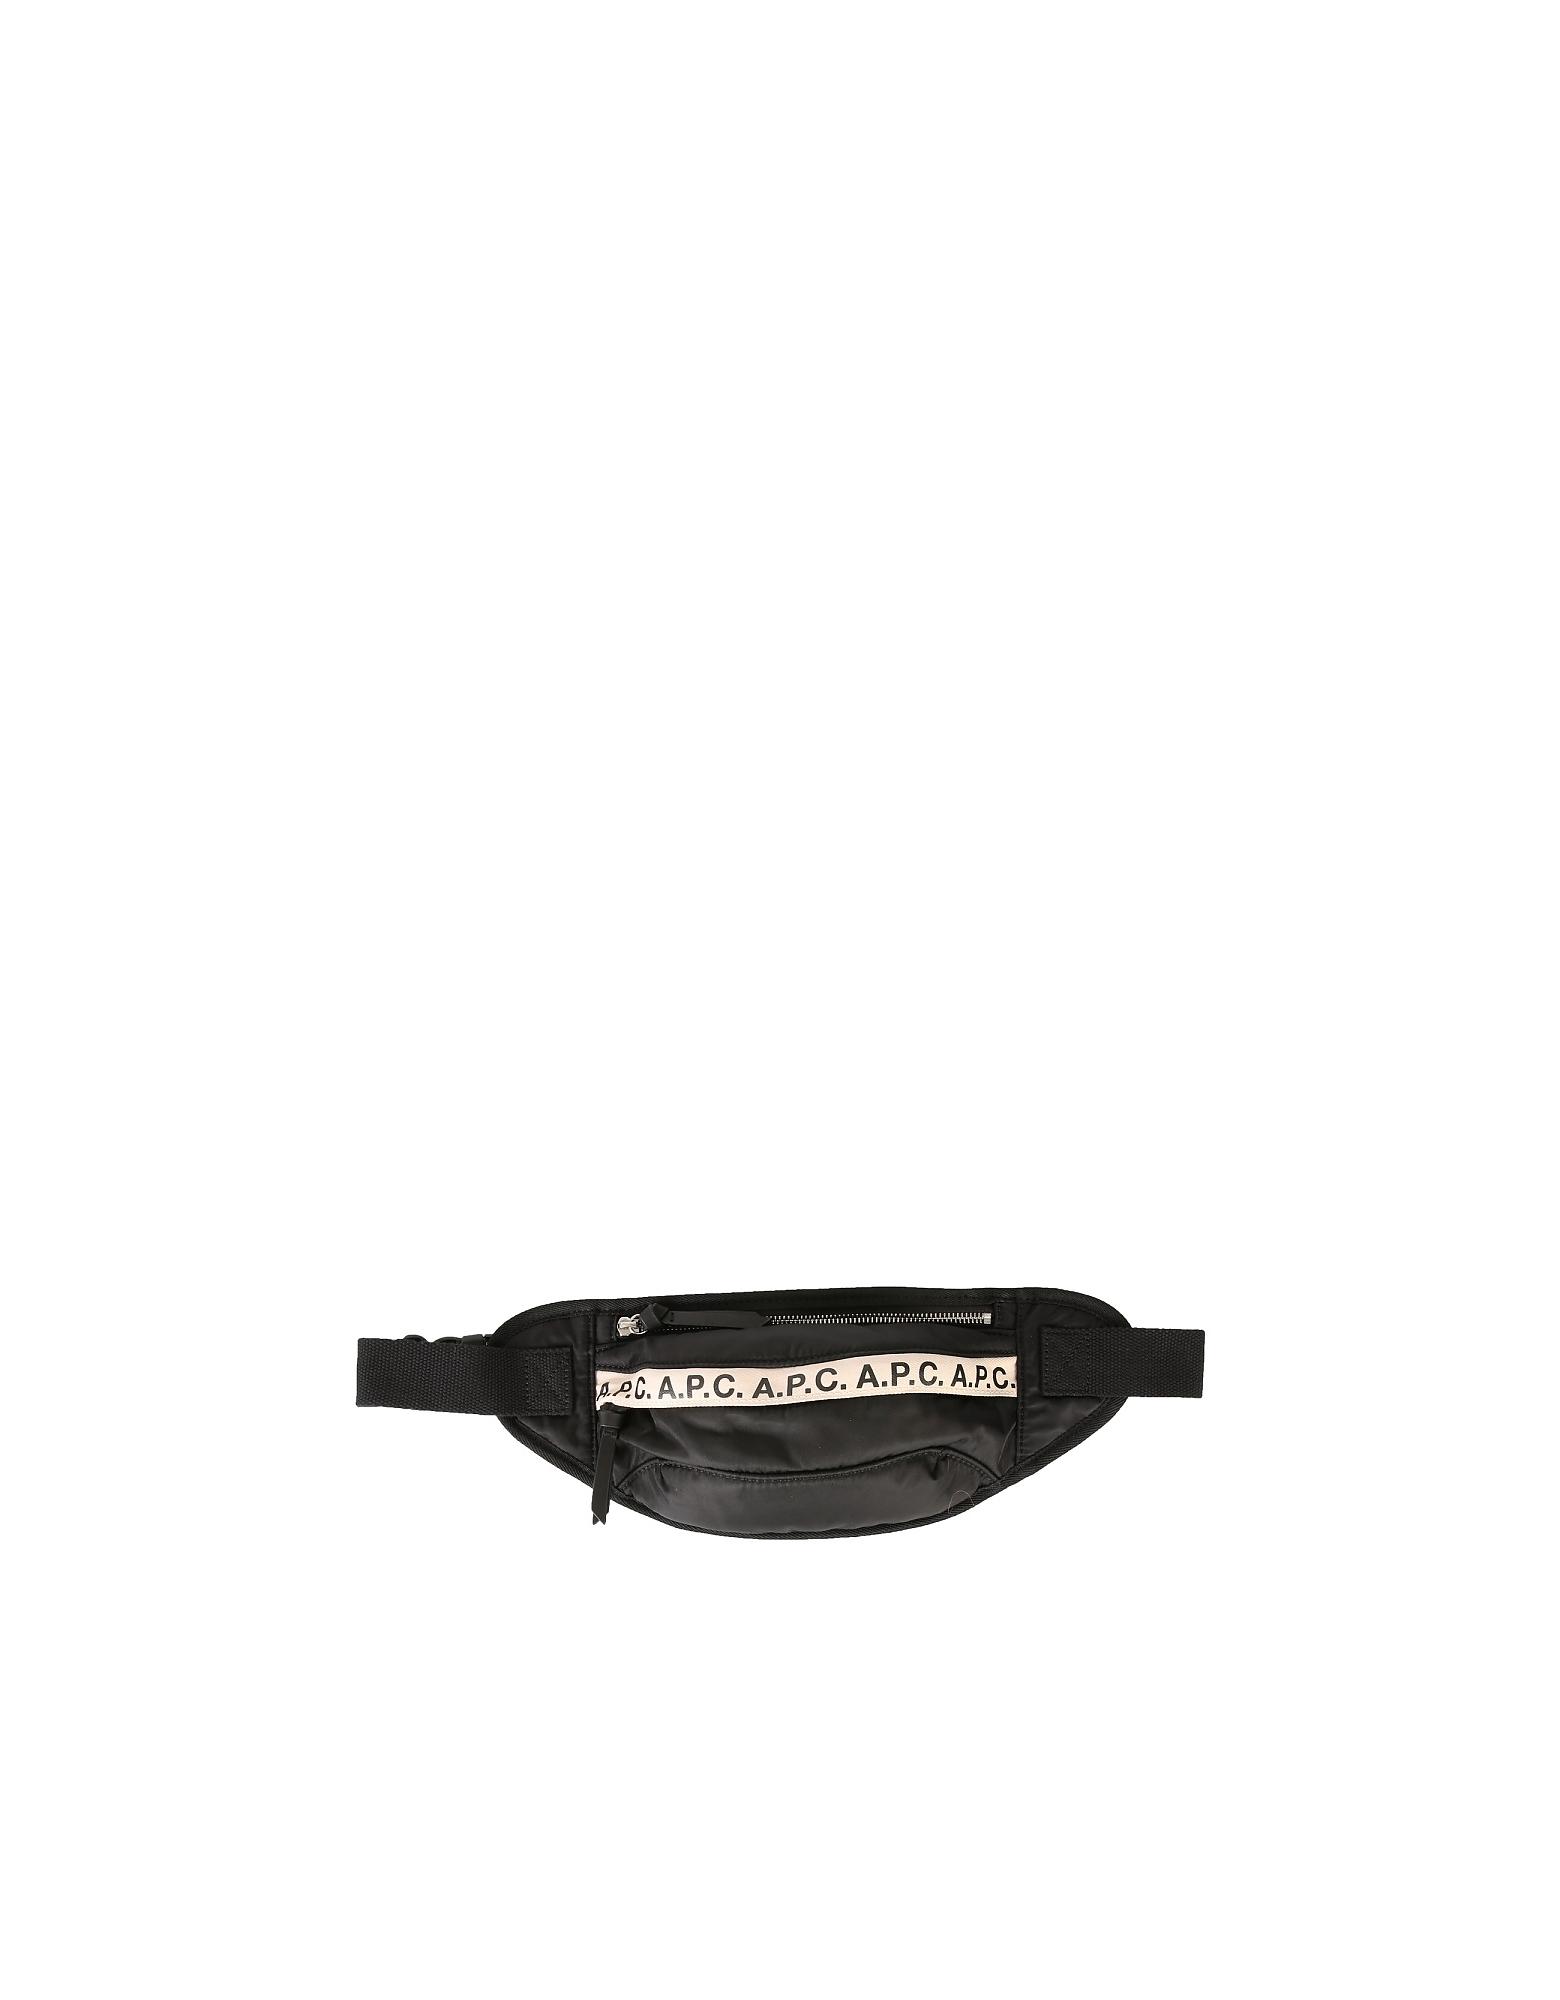 A.P.C. Designer Men's Bags, Belt Bag With Logo